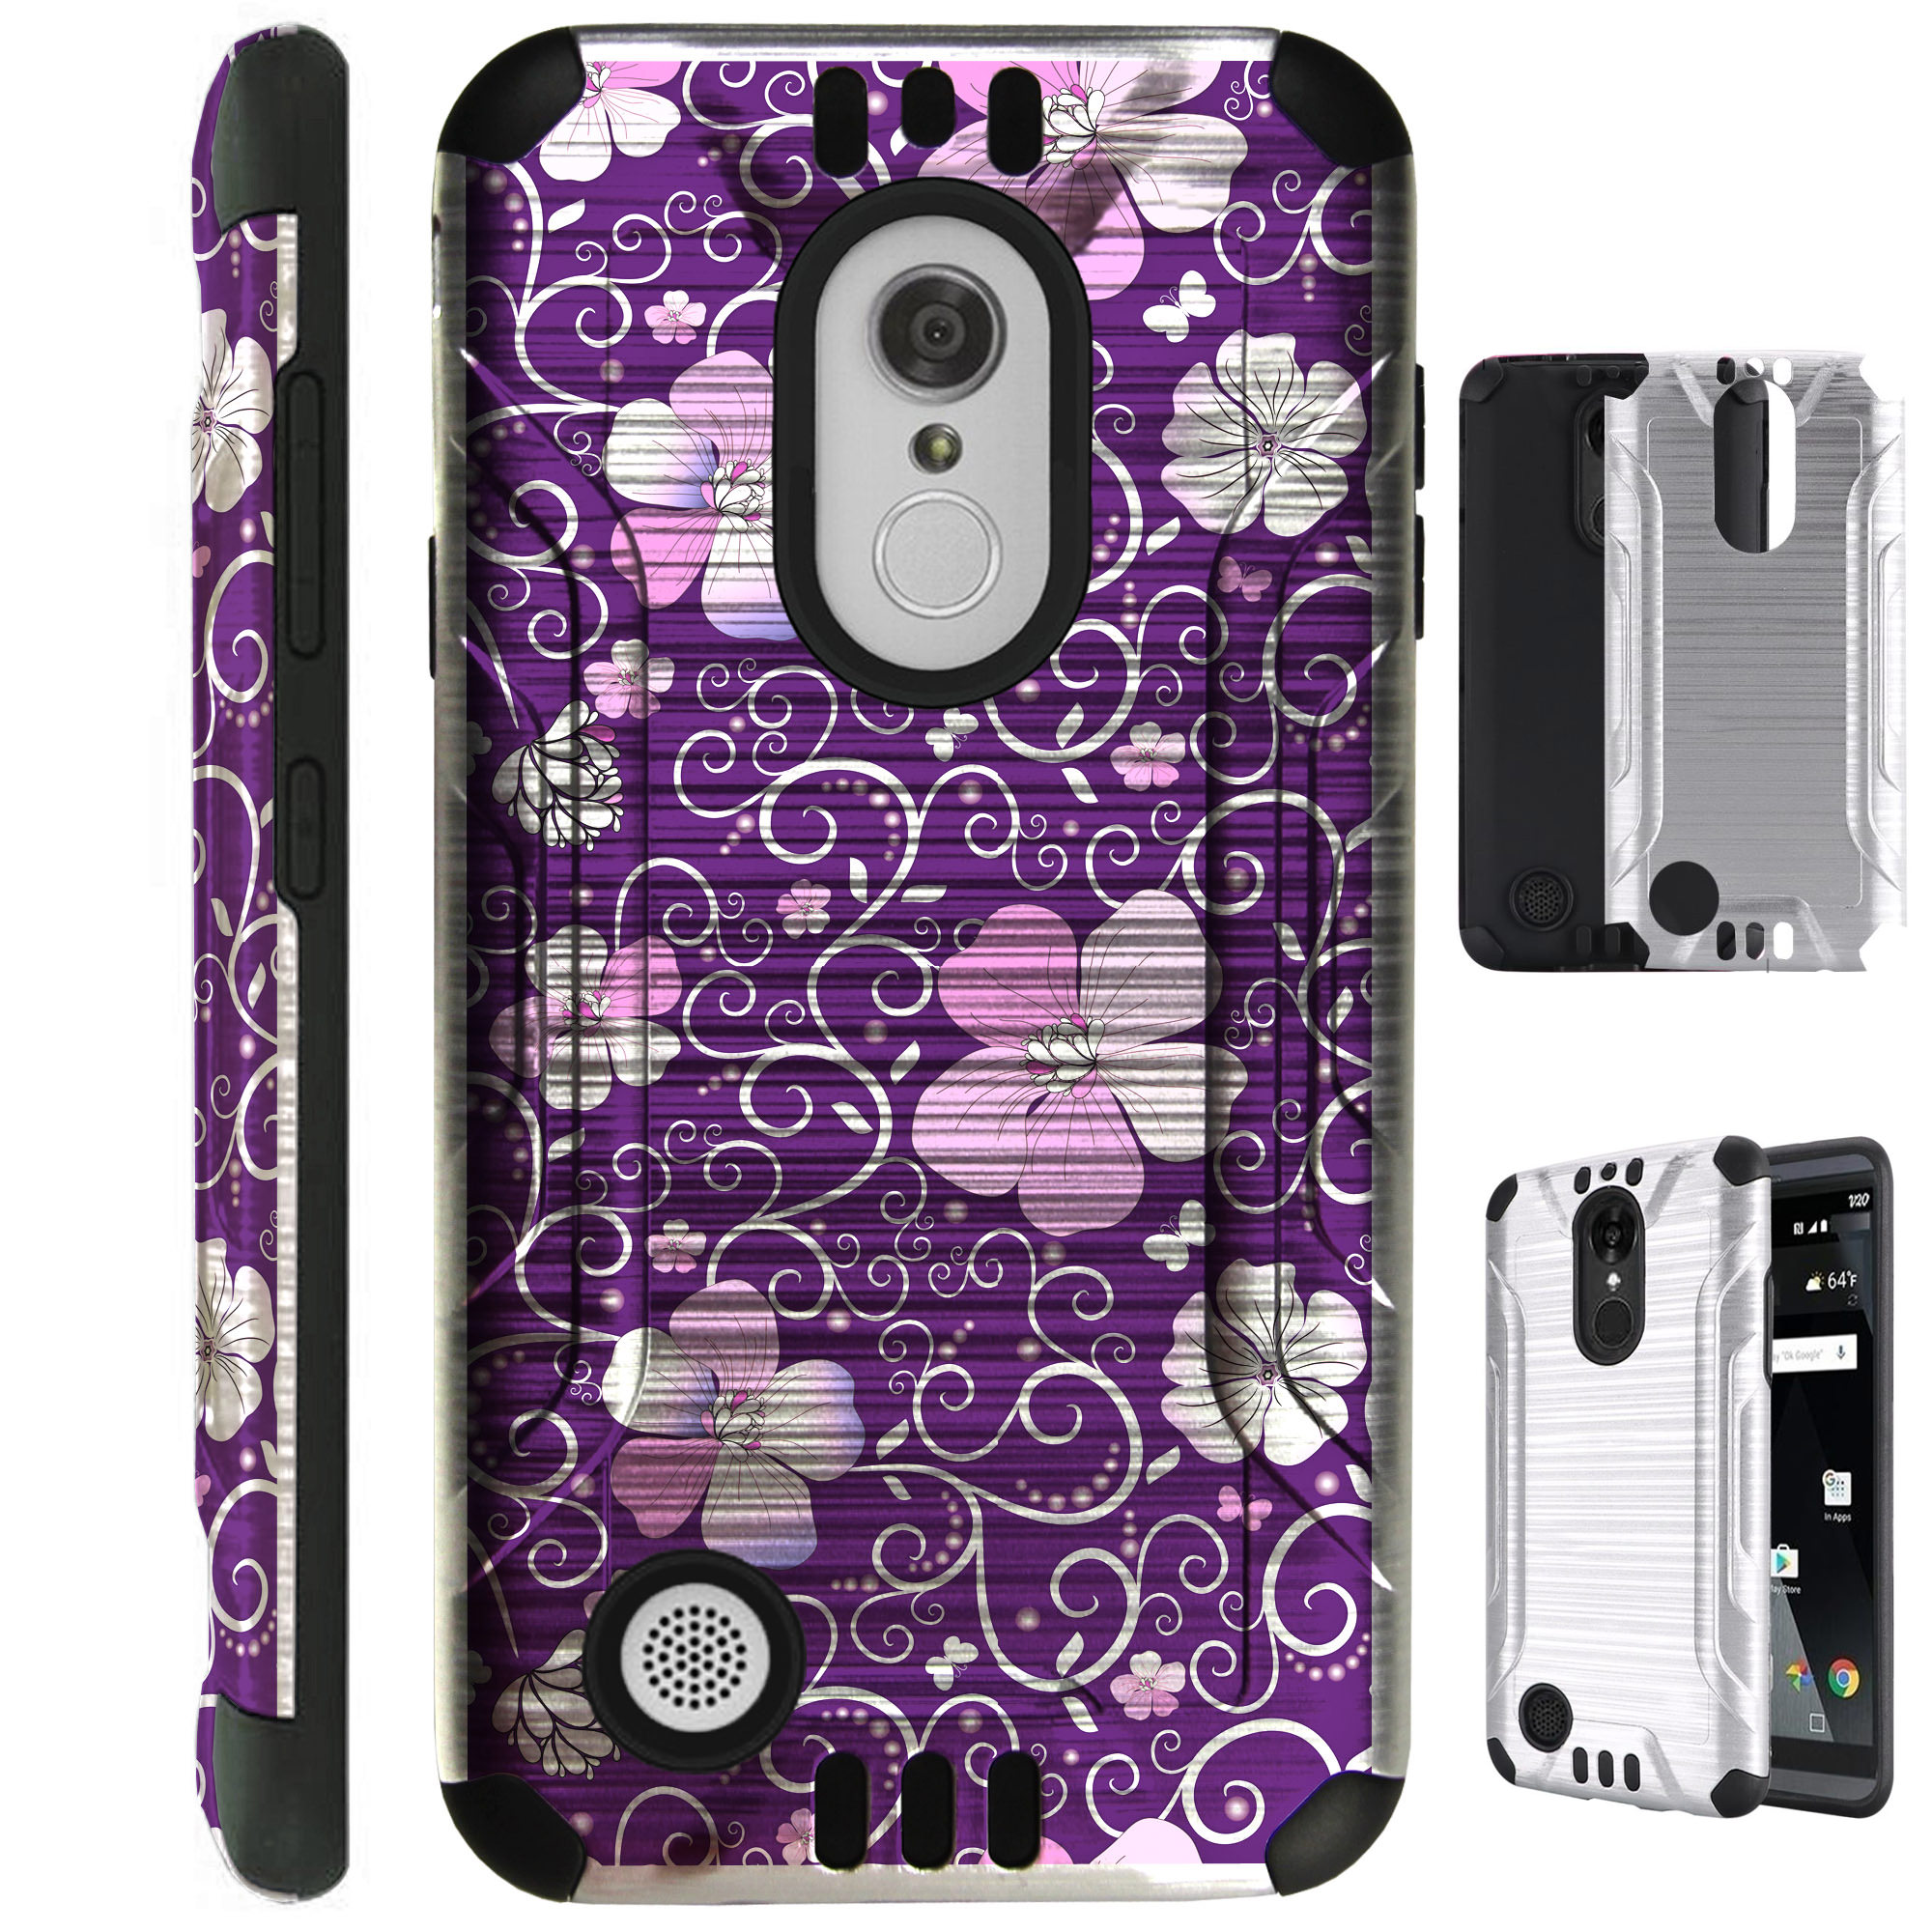 For LG Stylo 3 / LG Stylo 3 Plus LS777 Case Brushed Metal Texture Hybrid TPU Metallic Guard Phone Cover (Purple Flowe Vine)